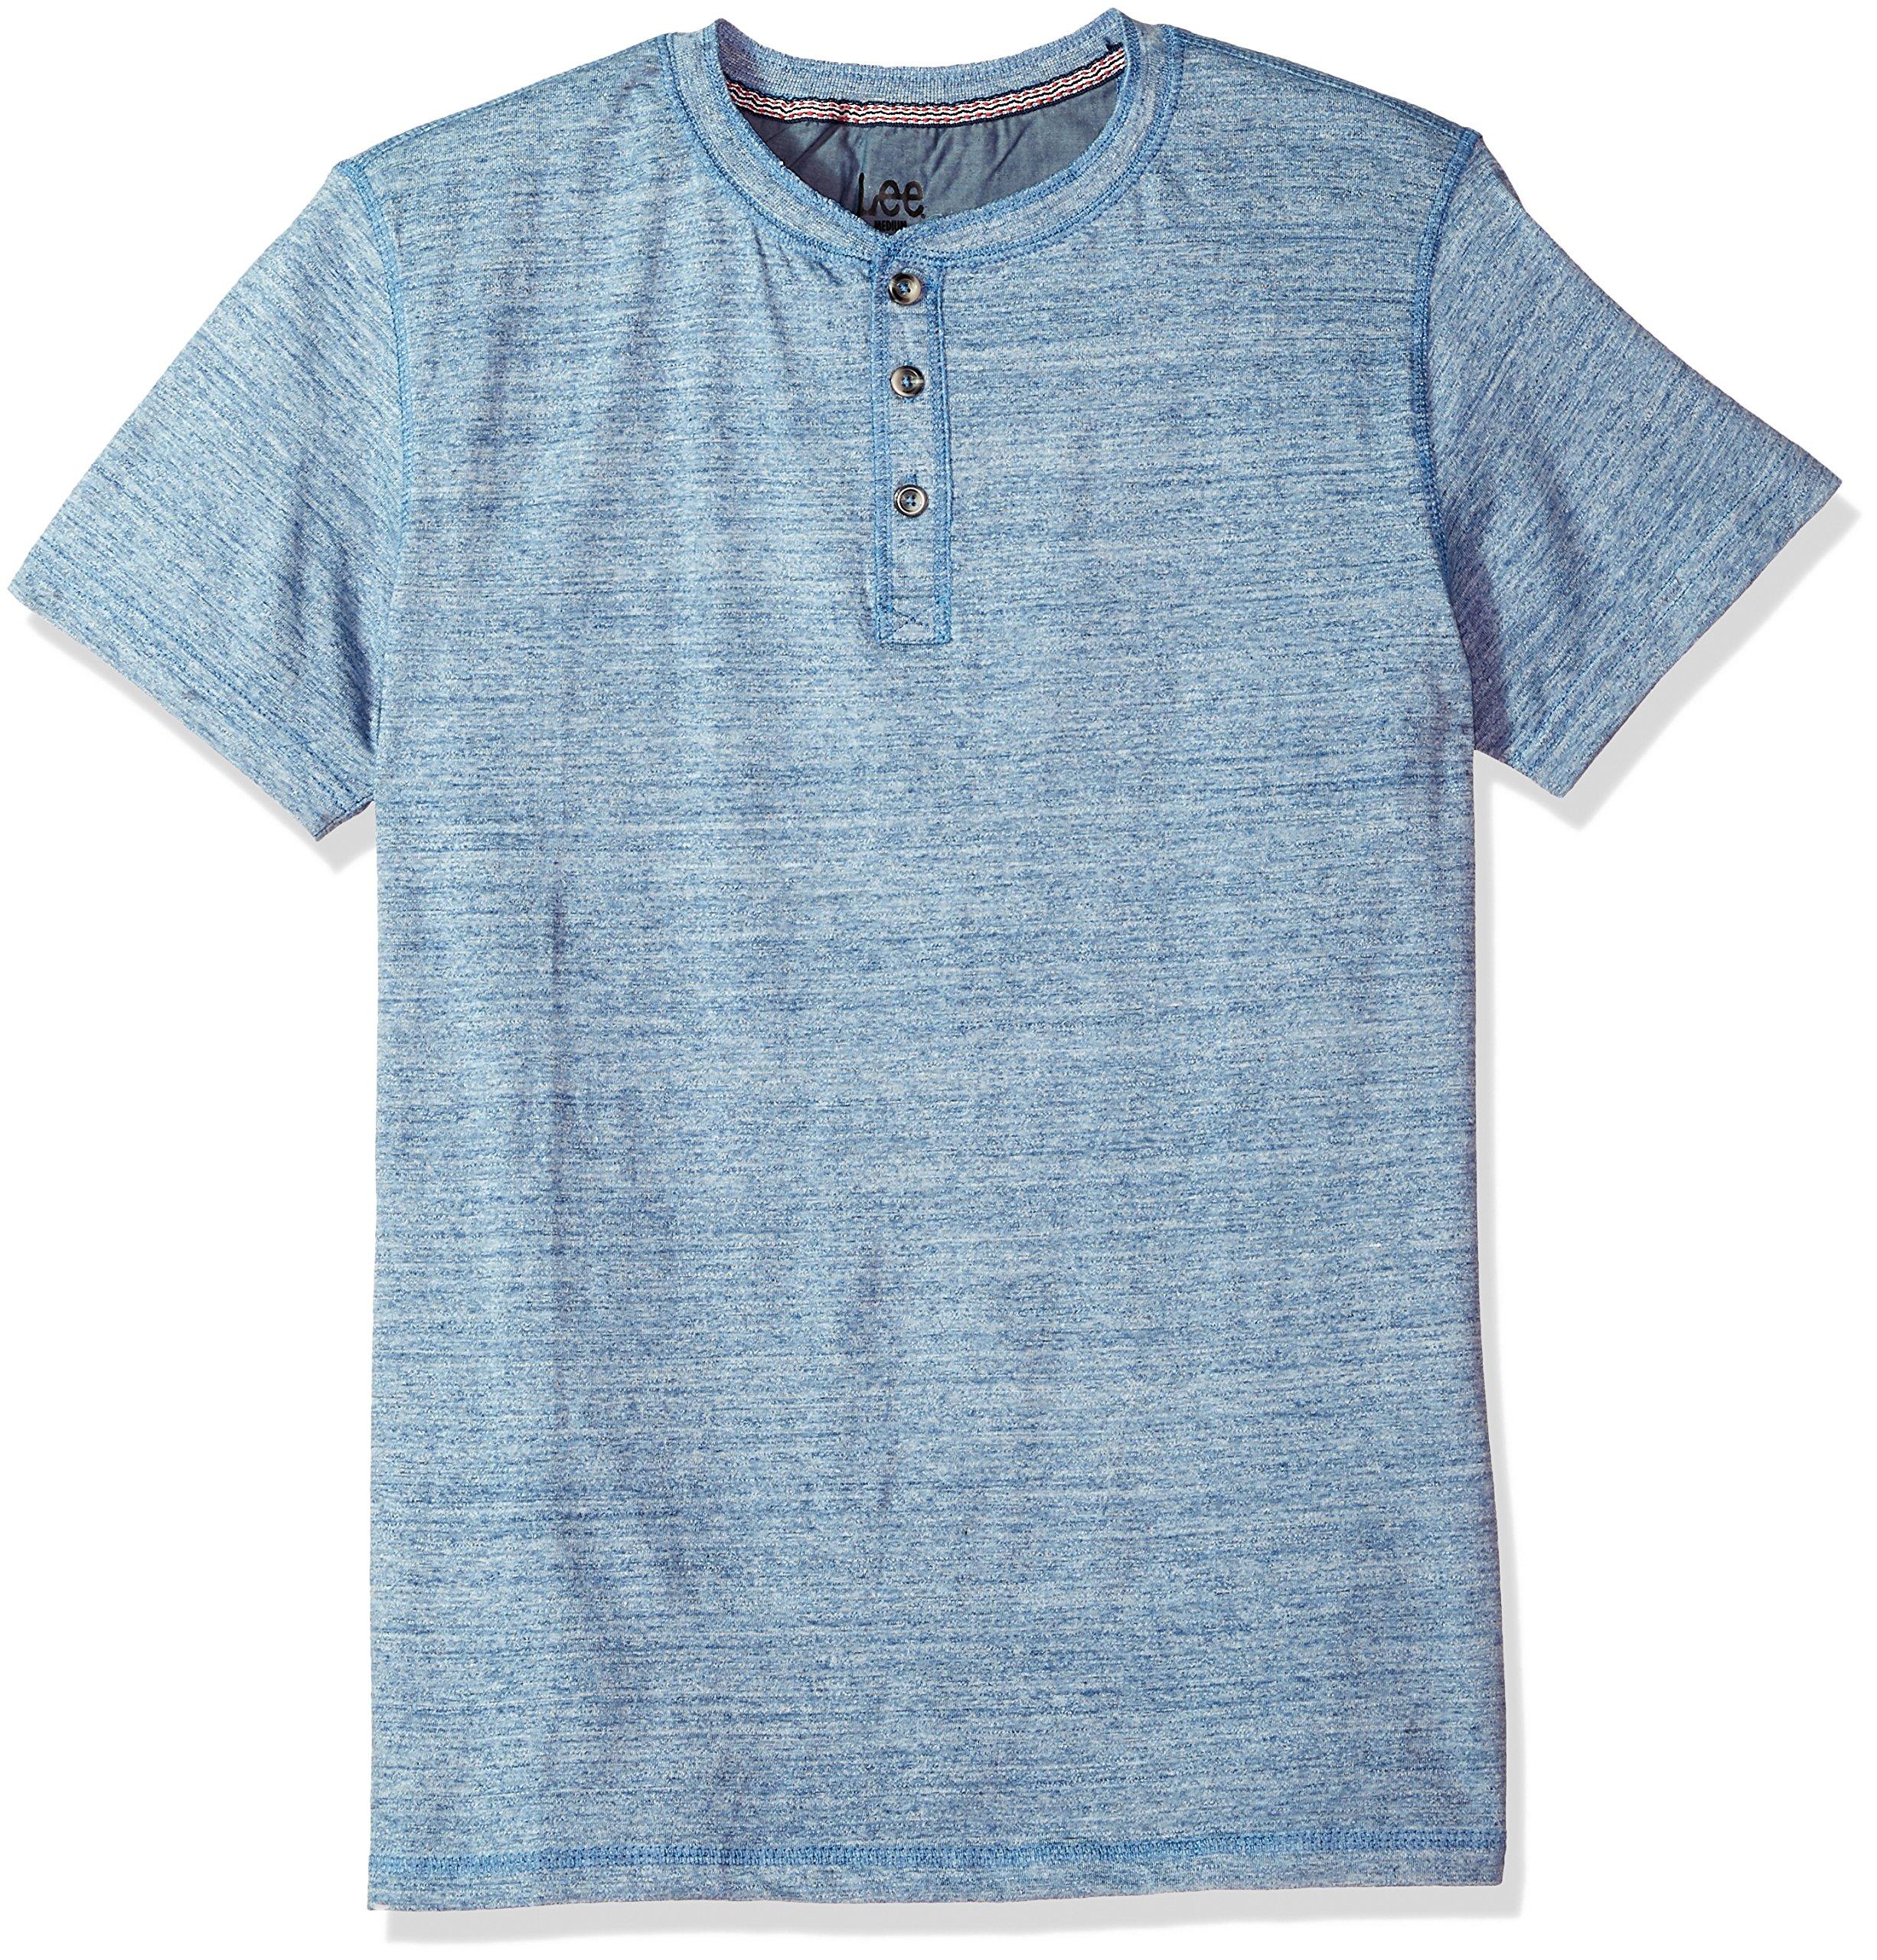 LEE Men's Short Sleeve Henley Tee, Limoges, X-Large